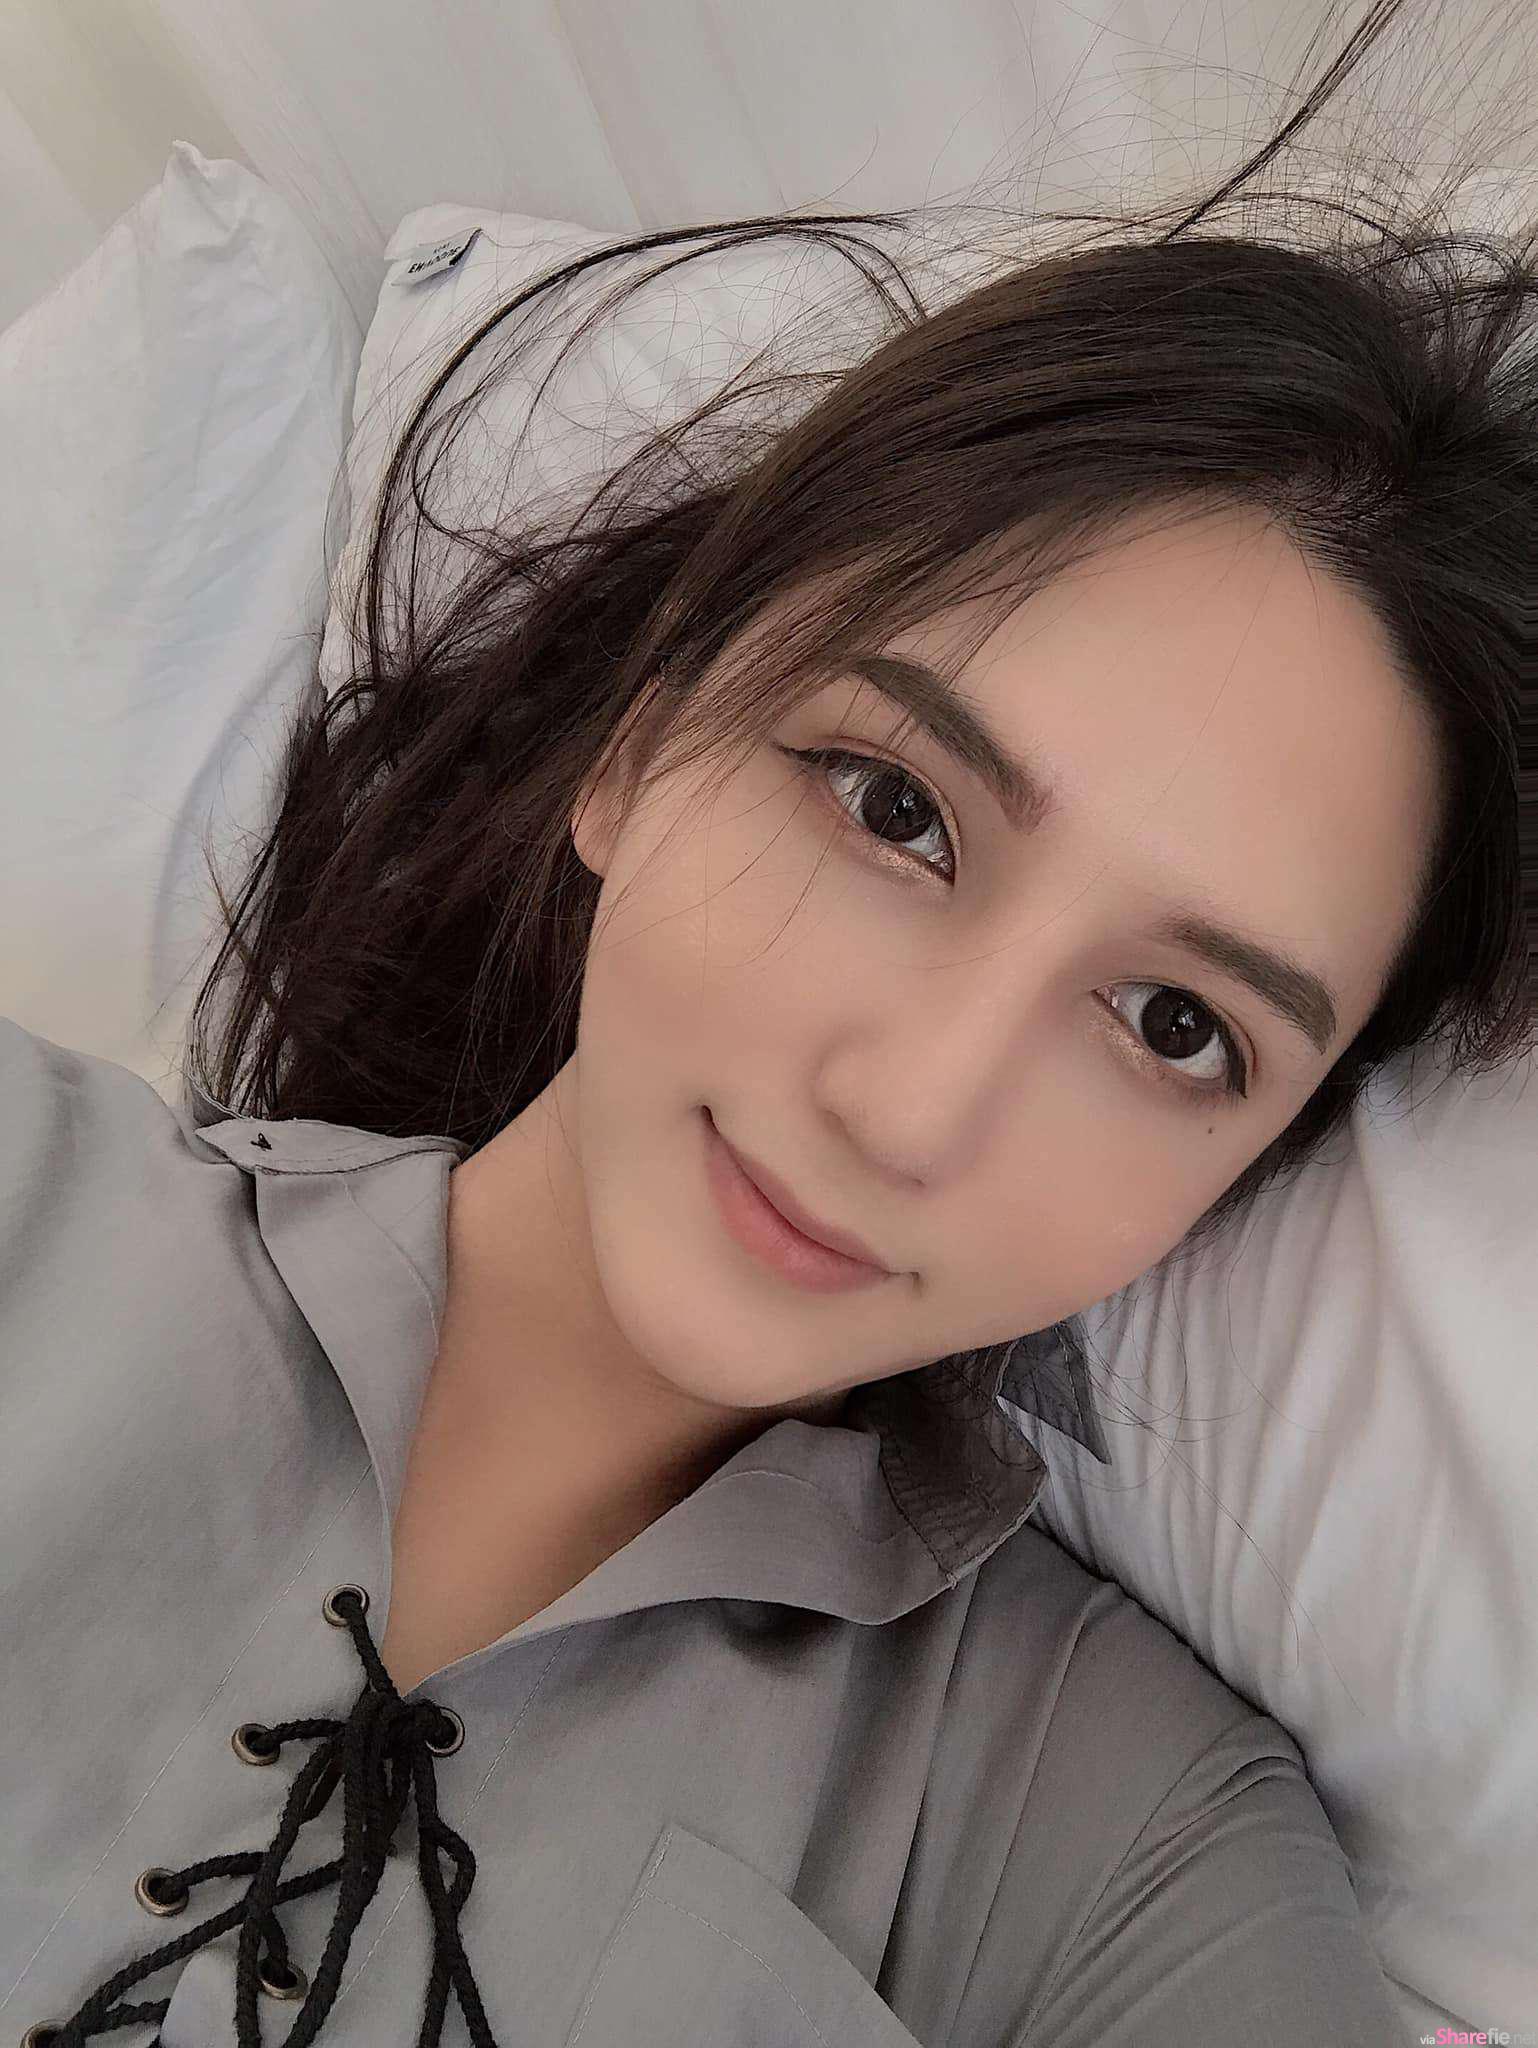 越南正妹Hoang Hoc,气质甜美